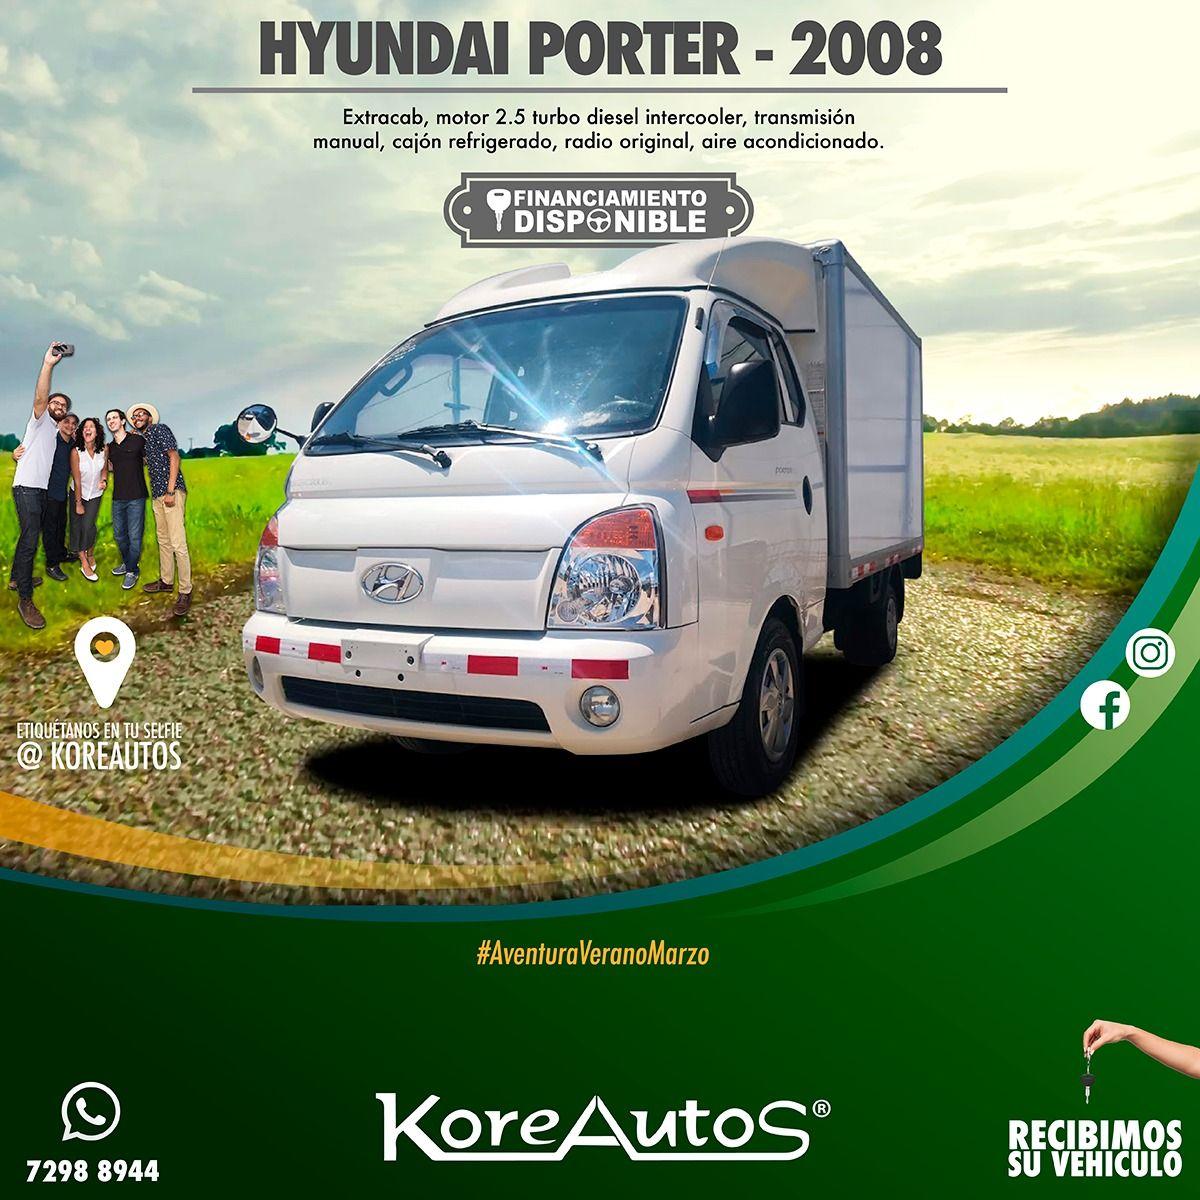 Hyundai (With images) Hyundai, Vehicles, Vans